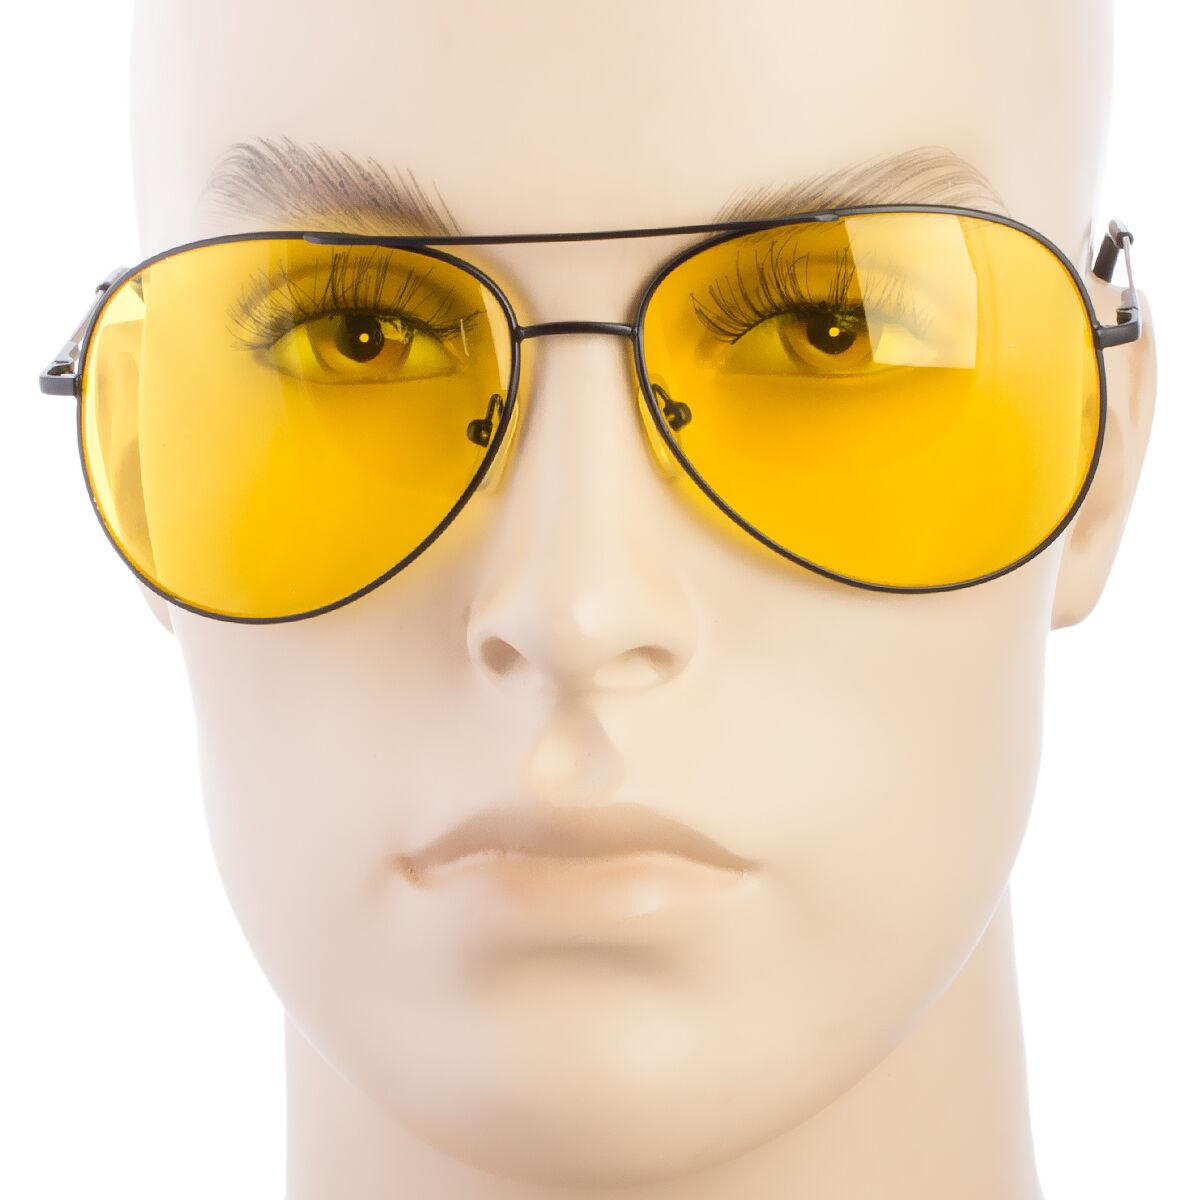 97116920e29b Мужские солнцезащитные очки SPORT AVIATOR HD NIGHT DRIVING PILOT SUNGLASSES  YELLOW HIGH DEFINITION GLASSES